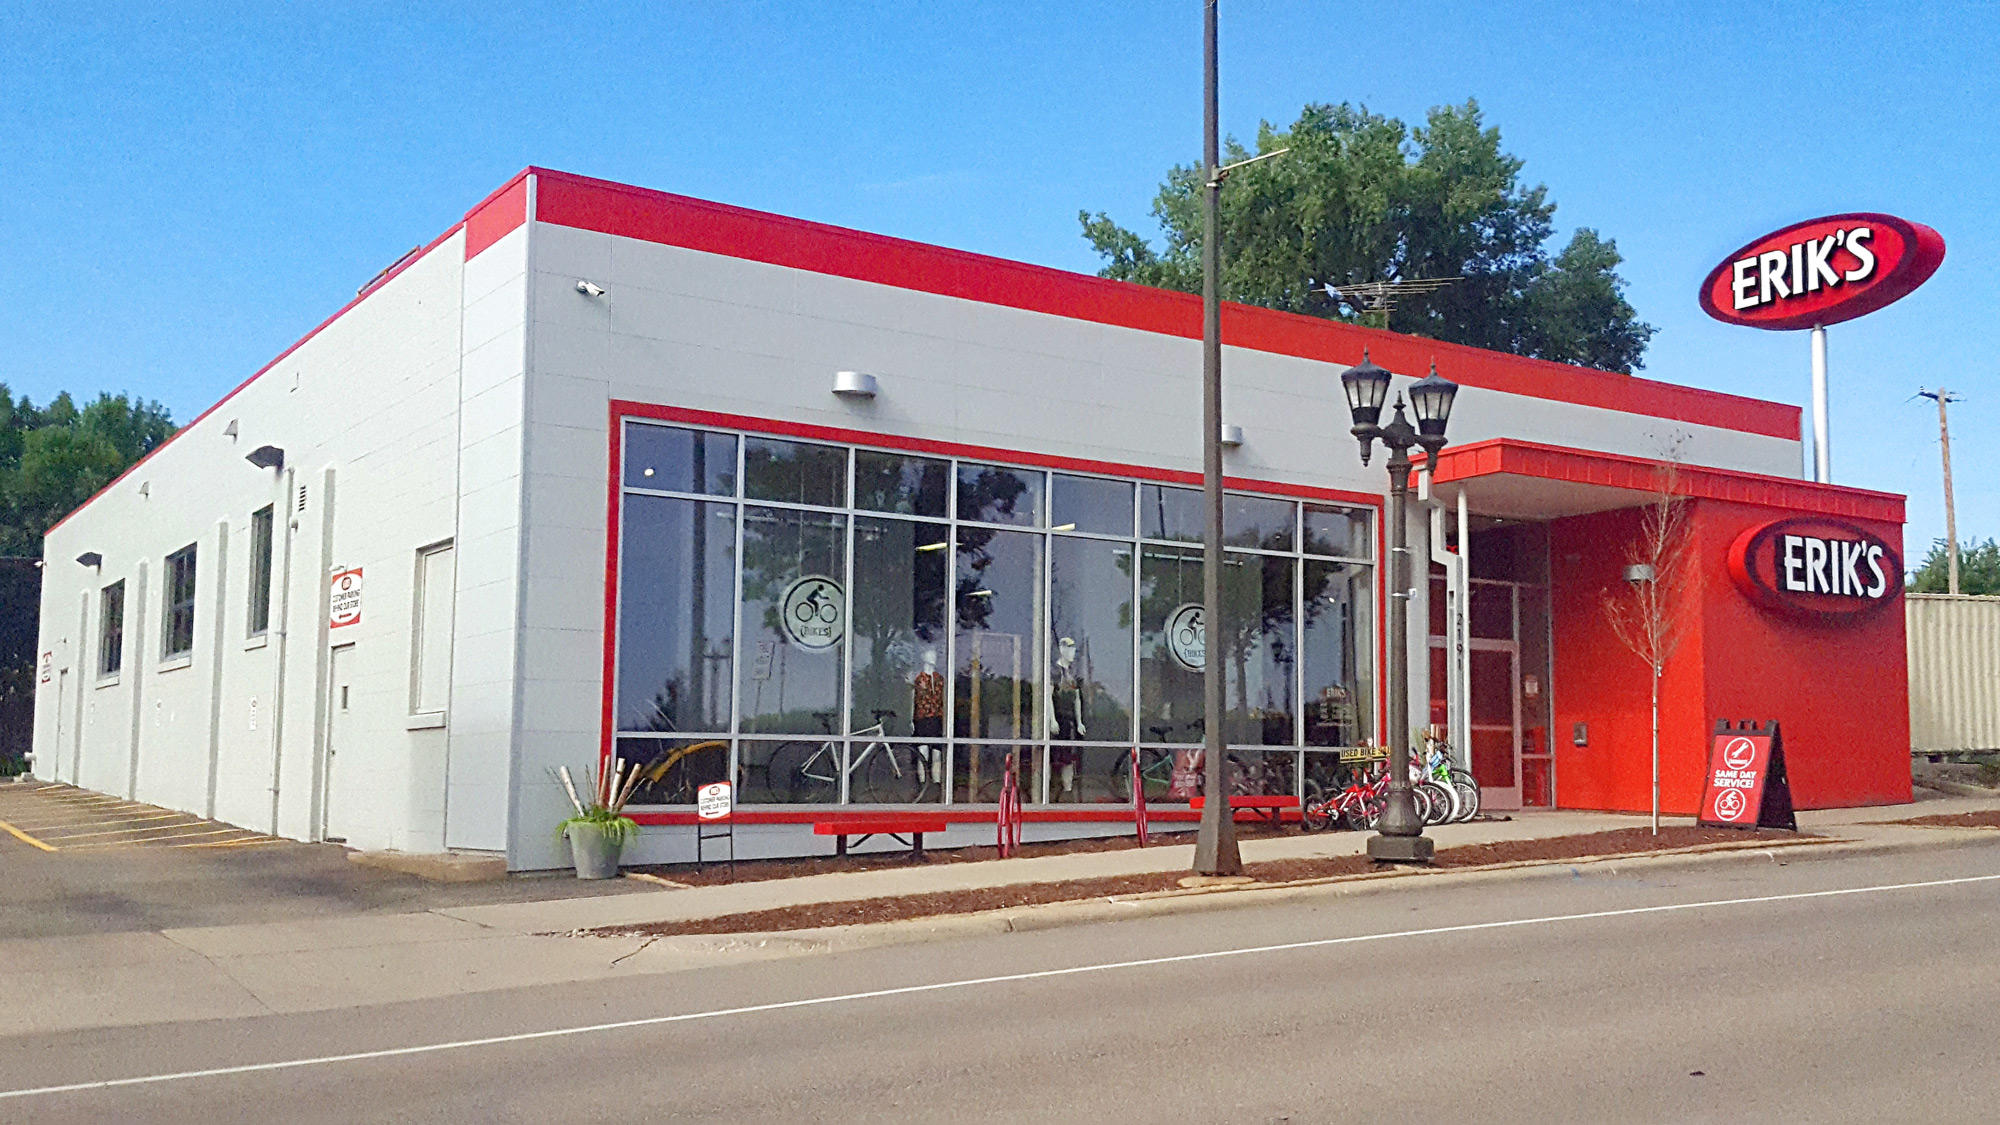 Saint Paul Highland Park Eriks bike shop storefront